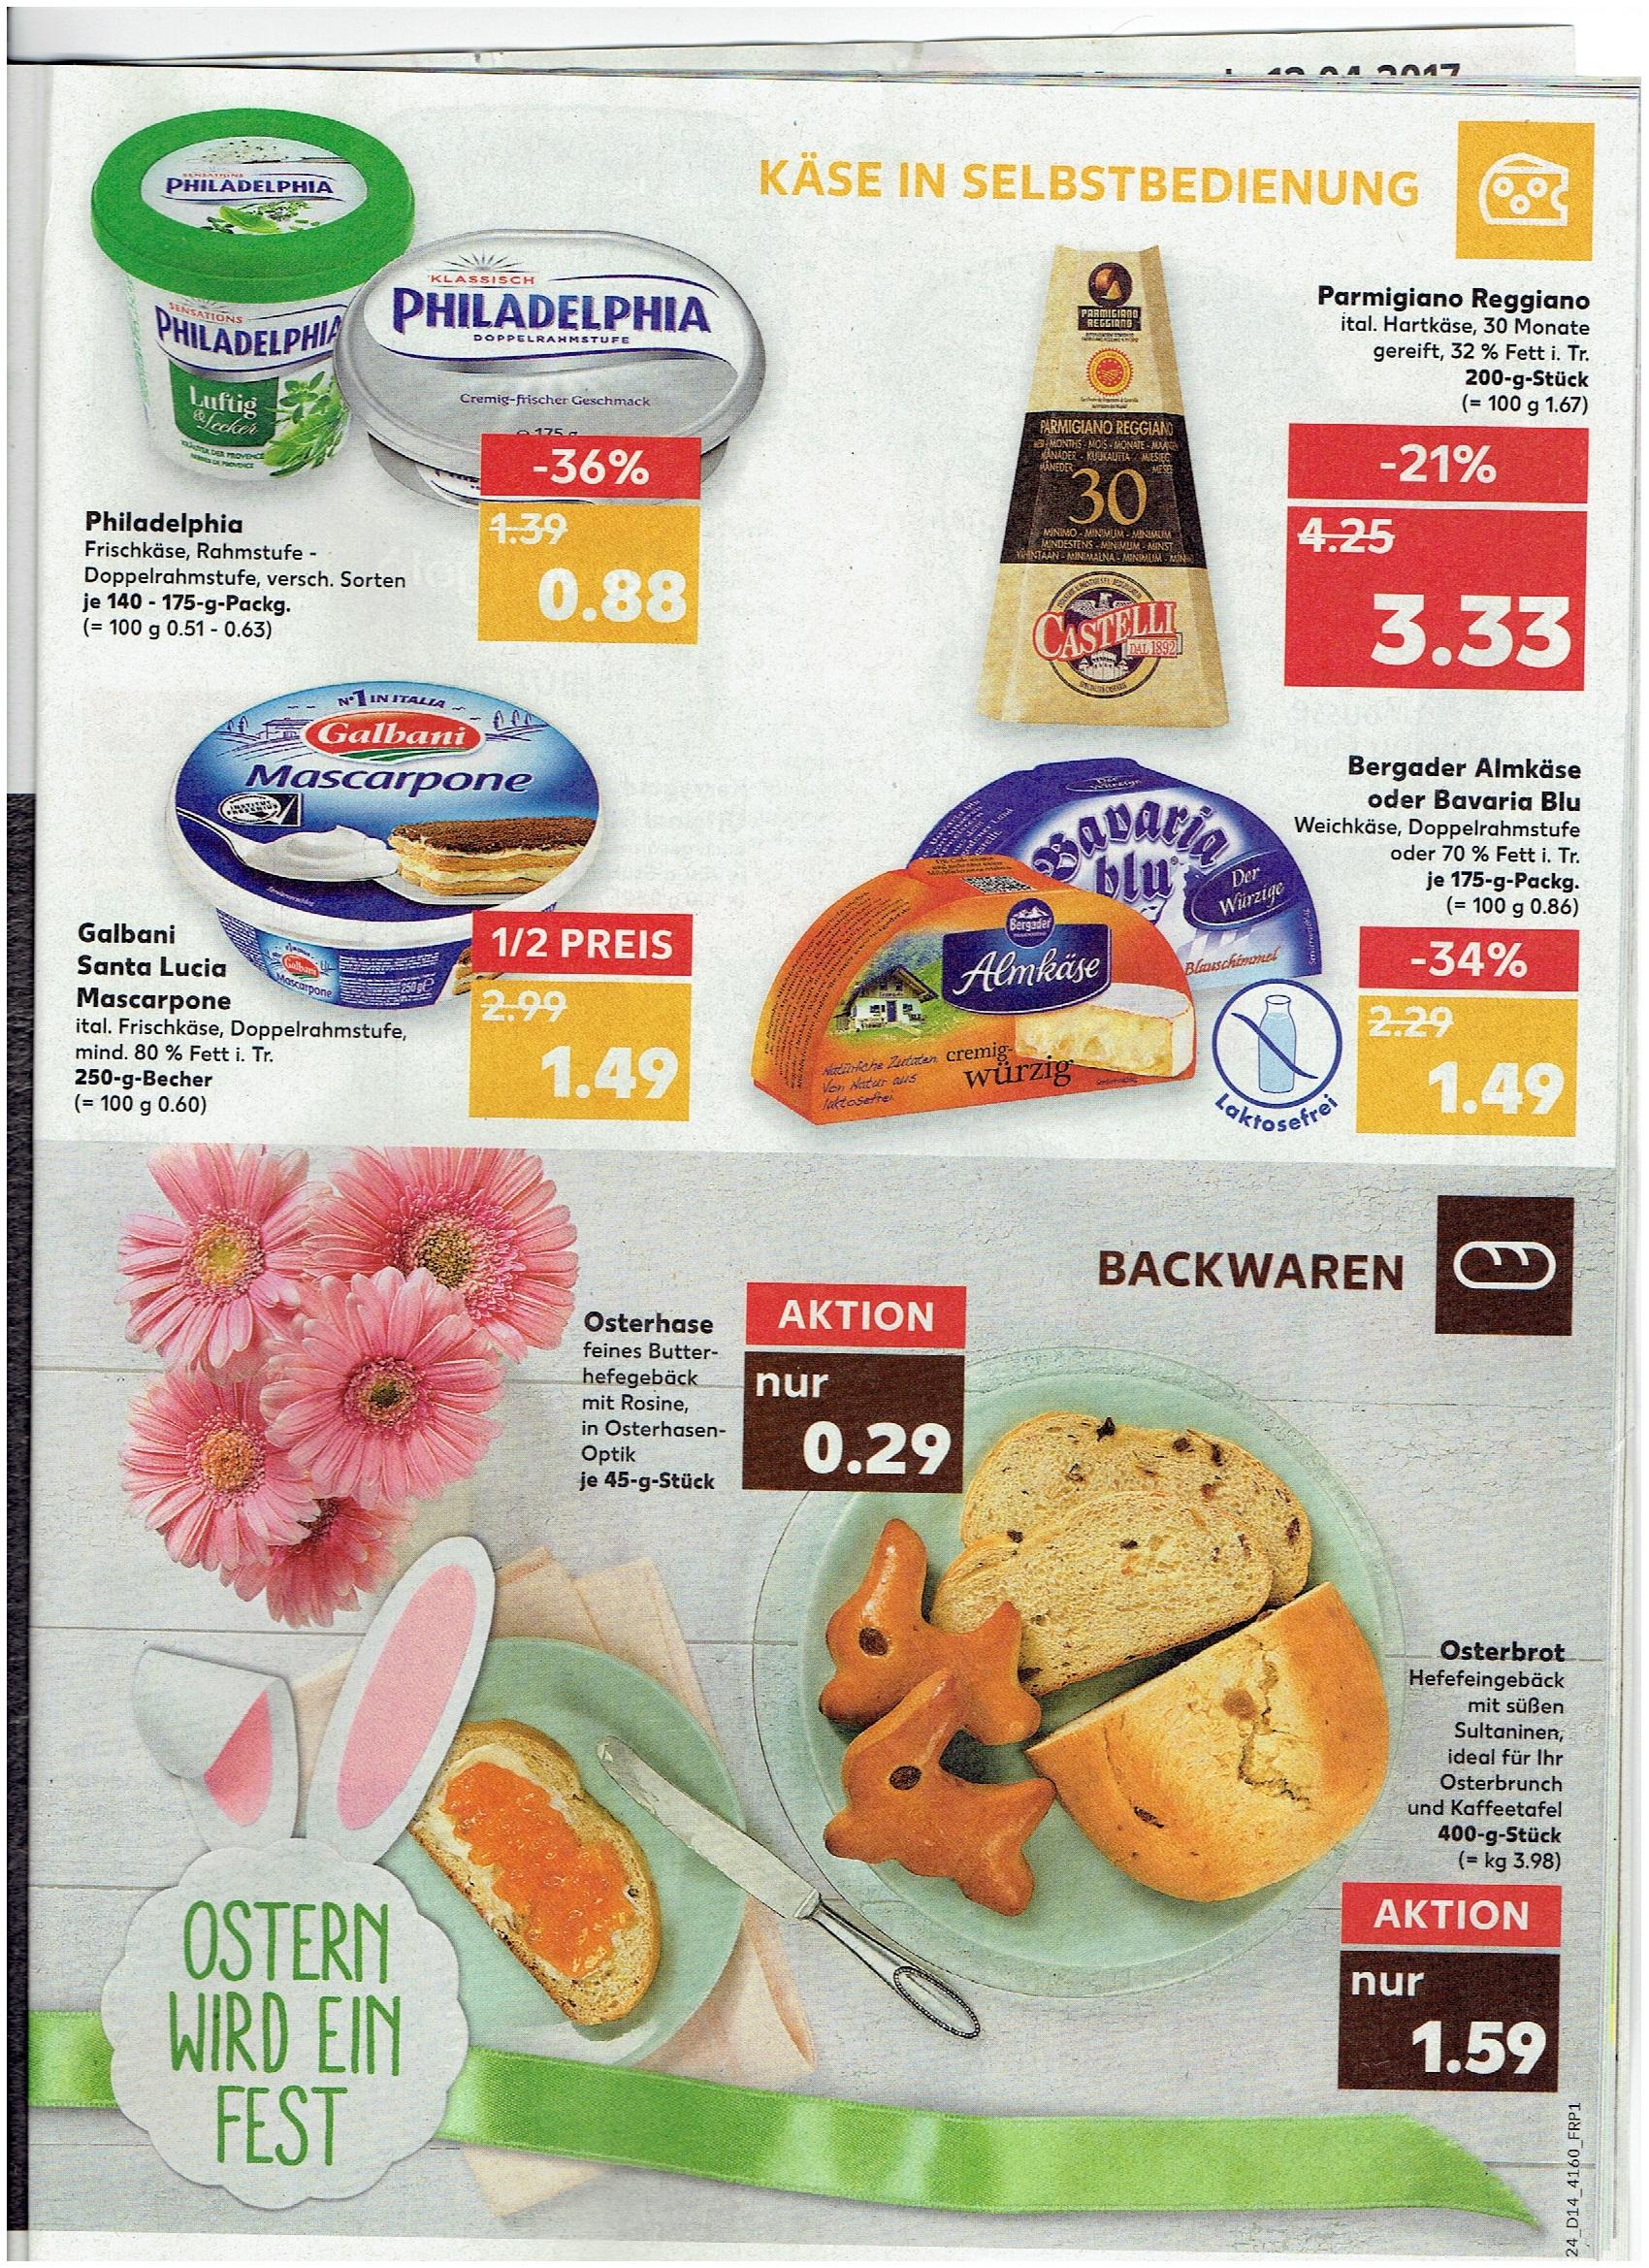 (Kaufland) Galbani Santa Lucia Mascarpone 1,49 € - 1,00 € (coupies) = 0,49 €